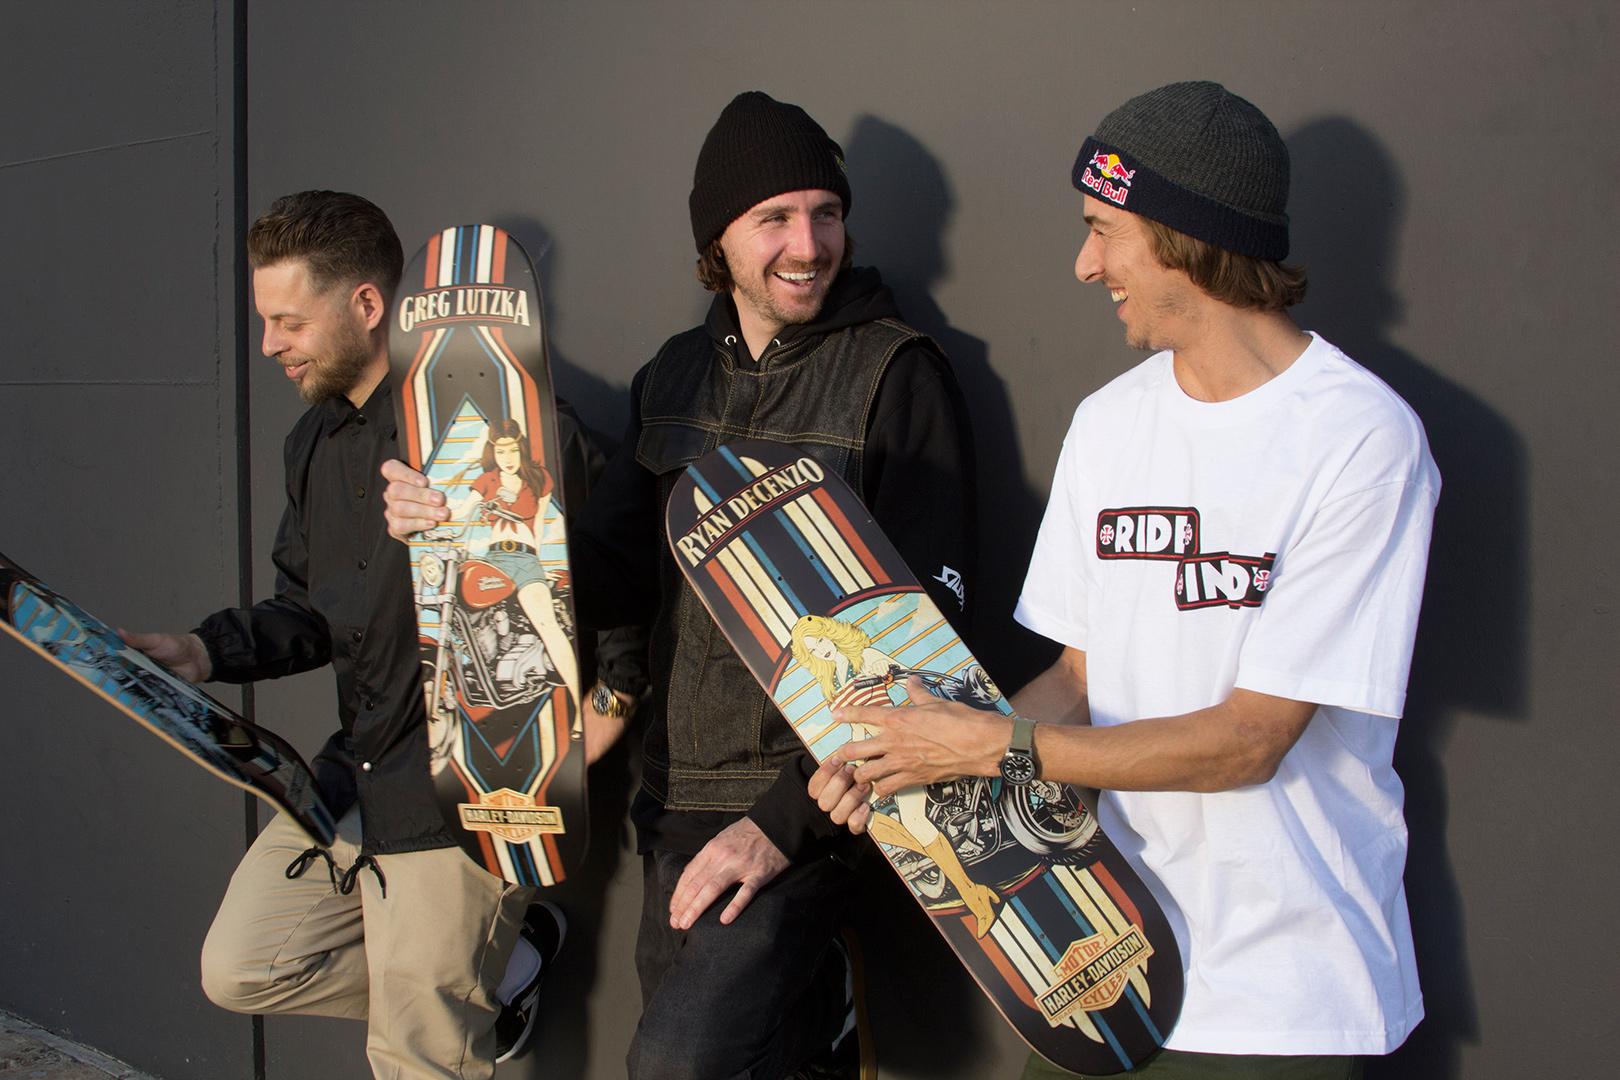 Darkstar-skateboards-harley-davidson-team.jpg